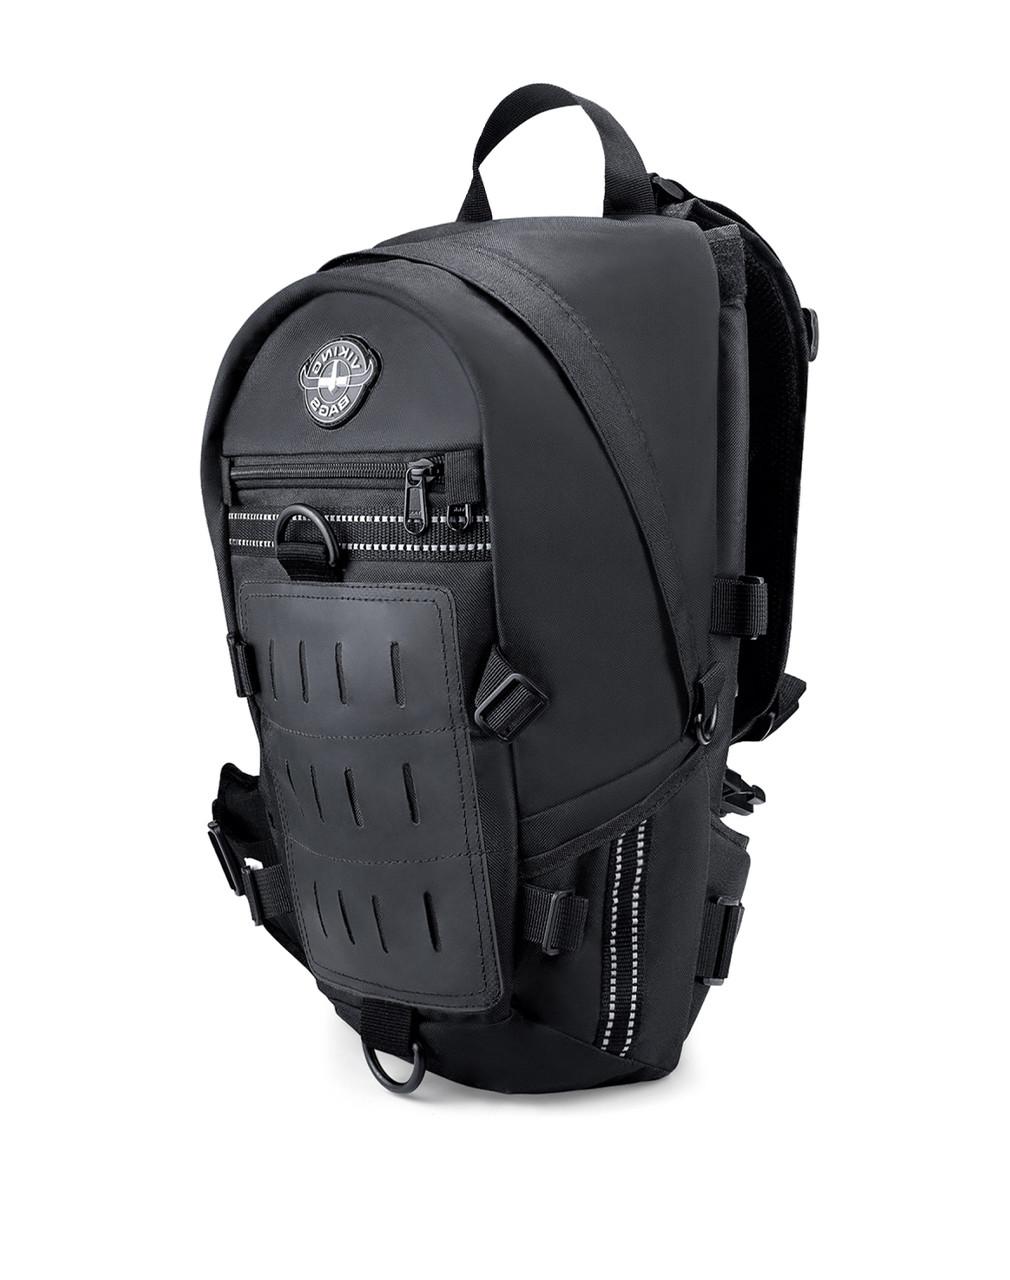 VikingBags Dirtman Medium Black Kawasaki Motorcycle Backpack Main Bag View